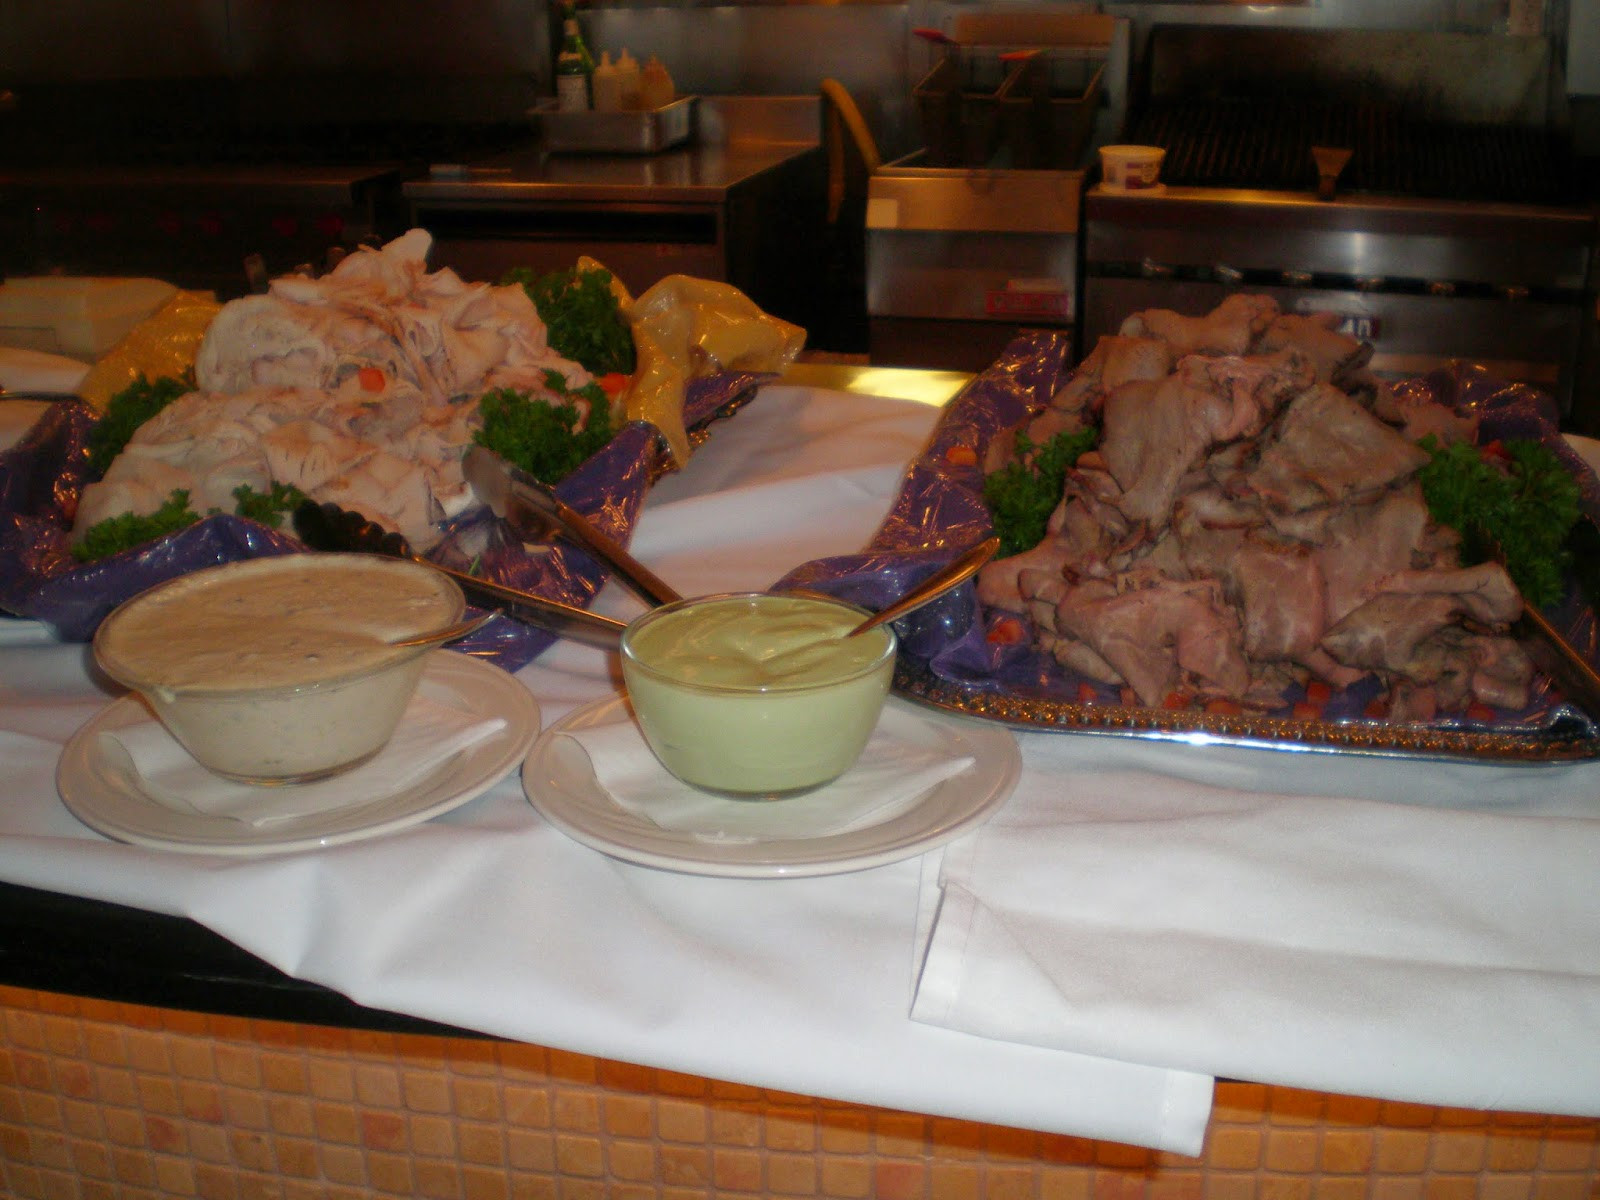 Easter Dinner At Restaurants  Restaurant Success Tips Easter Brunch Dinner Menu Ideas